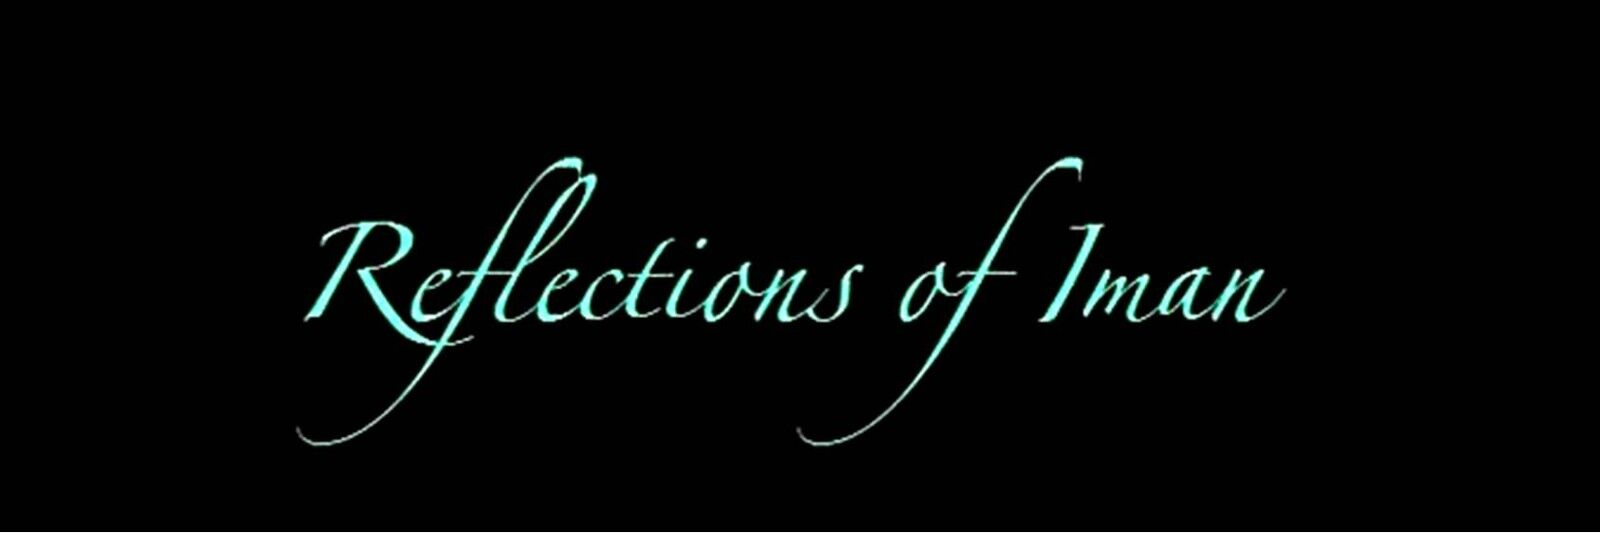 Reflections of Iman